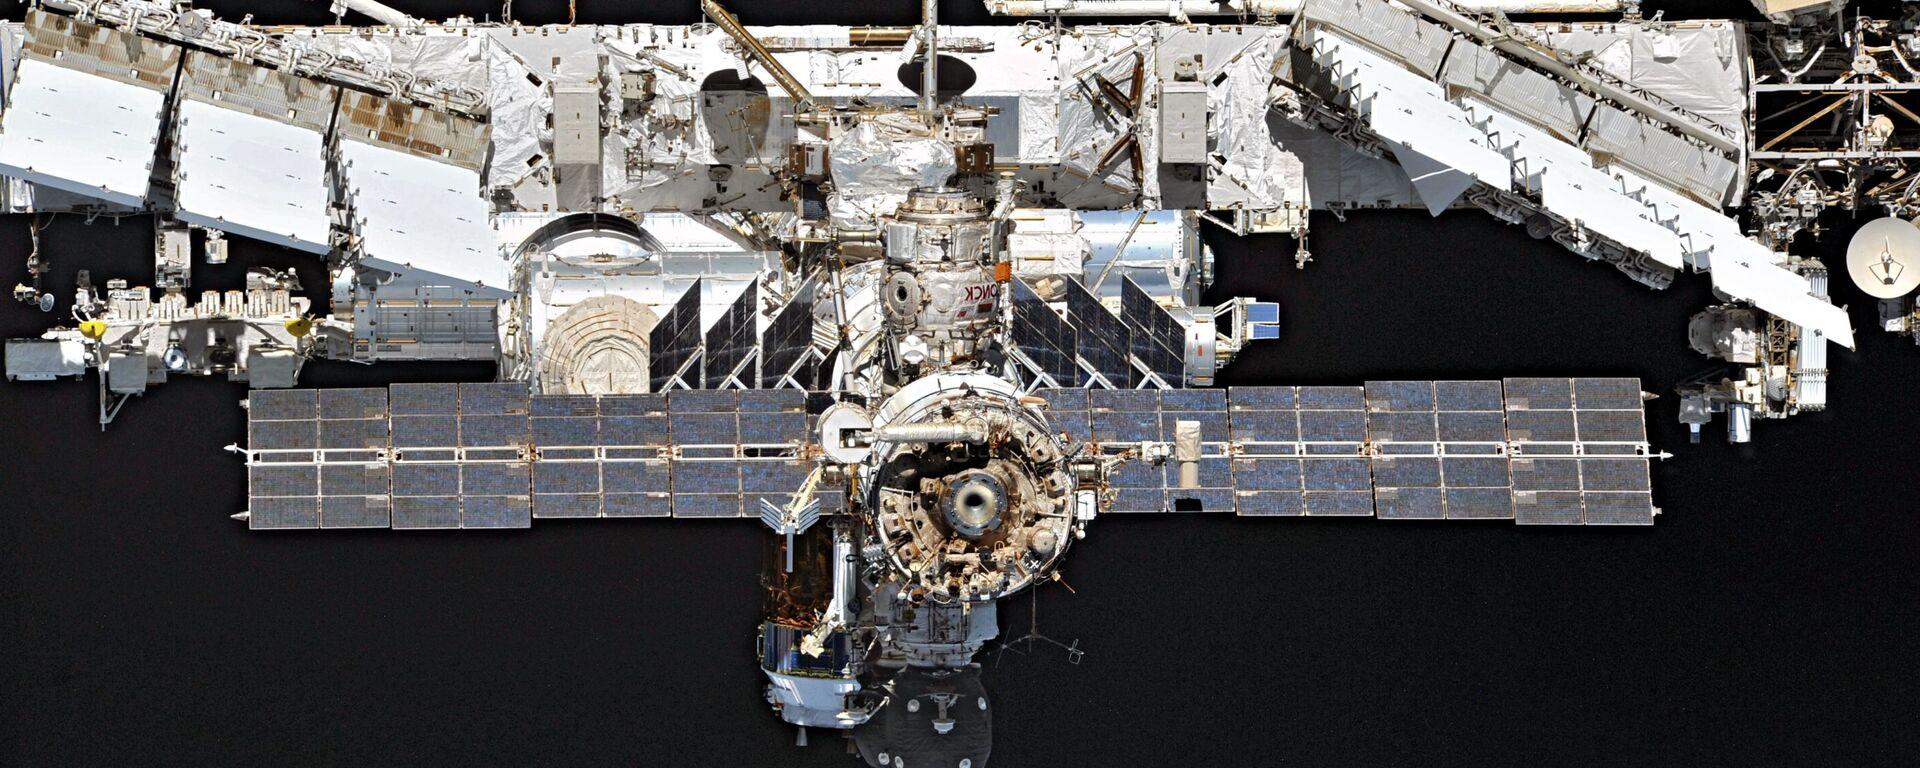 Estación Espacial Internacional (EEI) - Sputnik Mundo, 1920, 07.06.2021